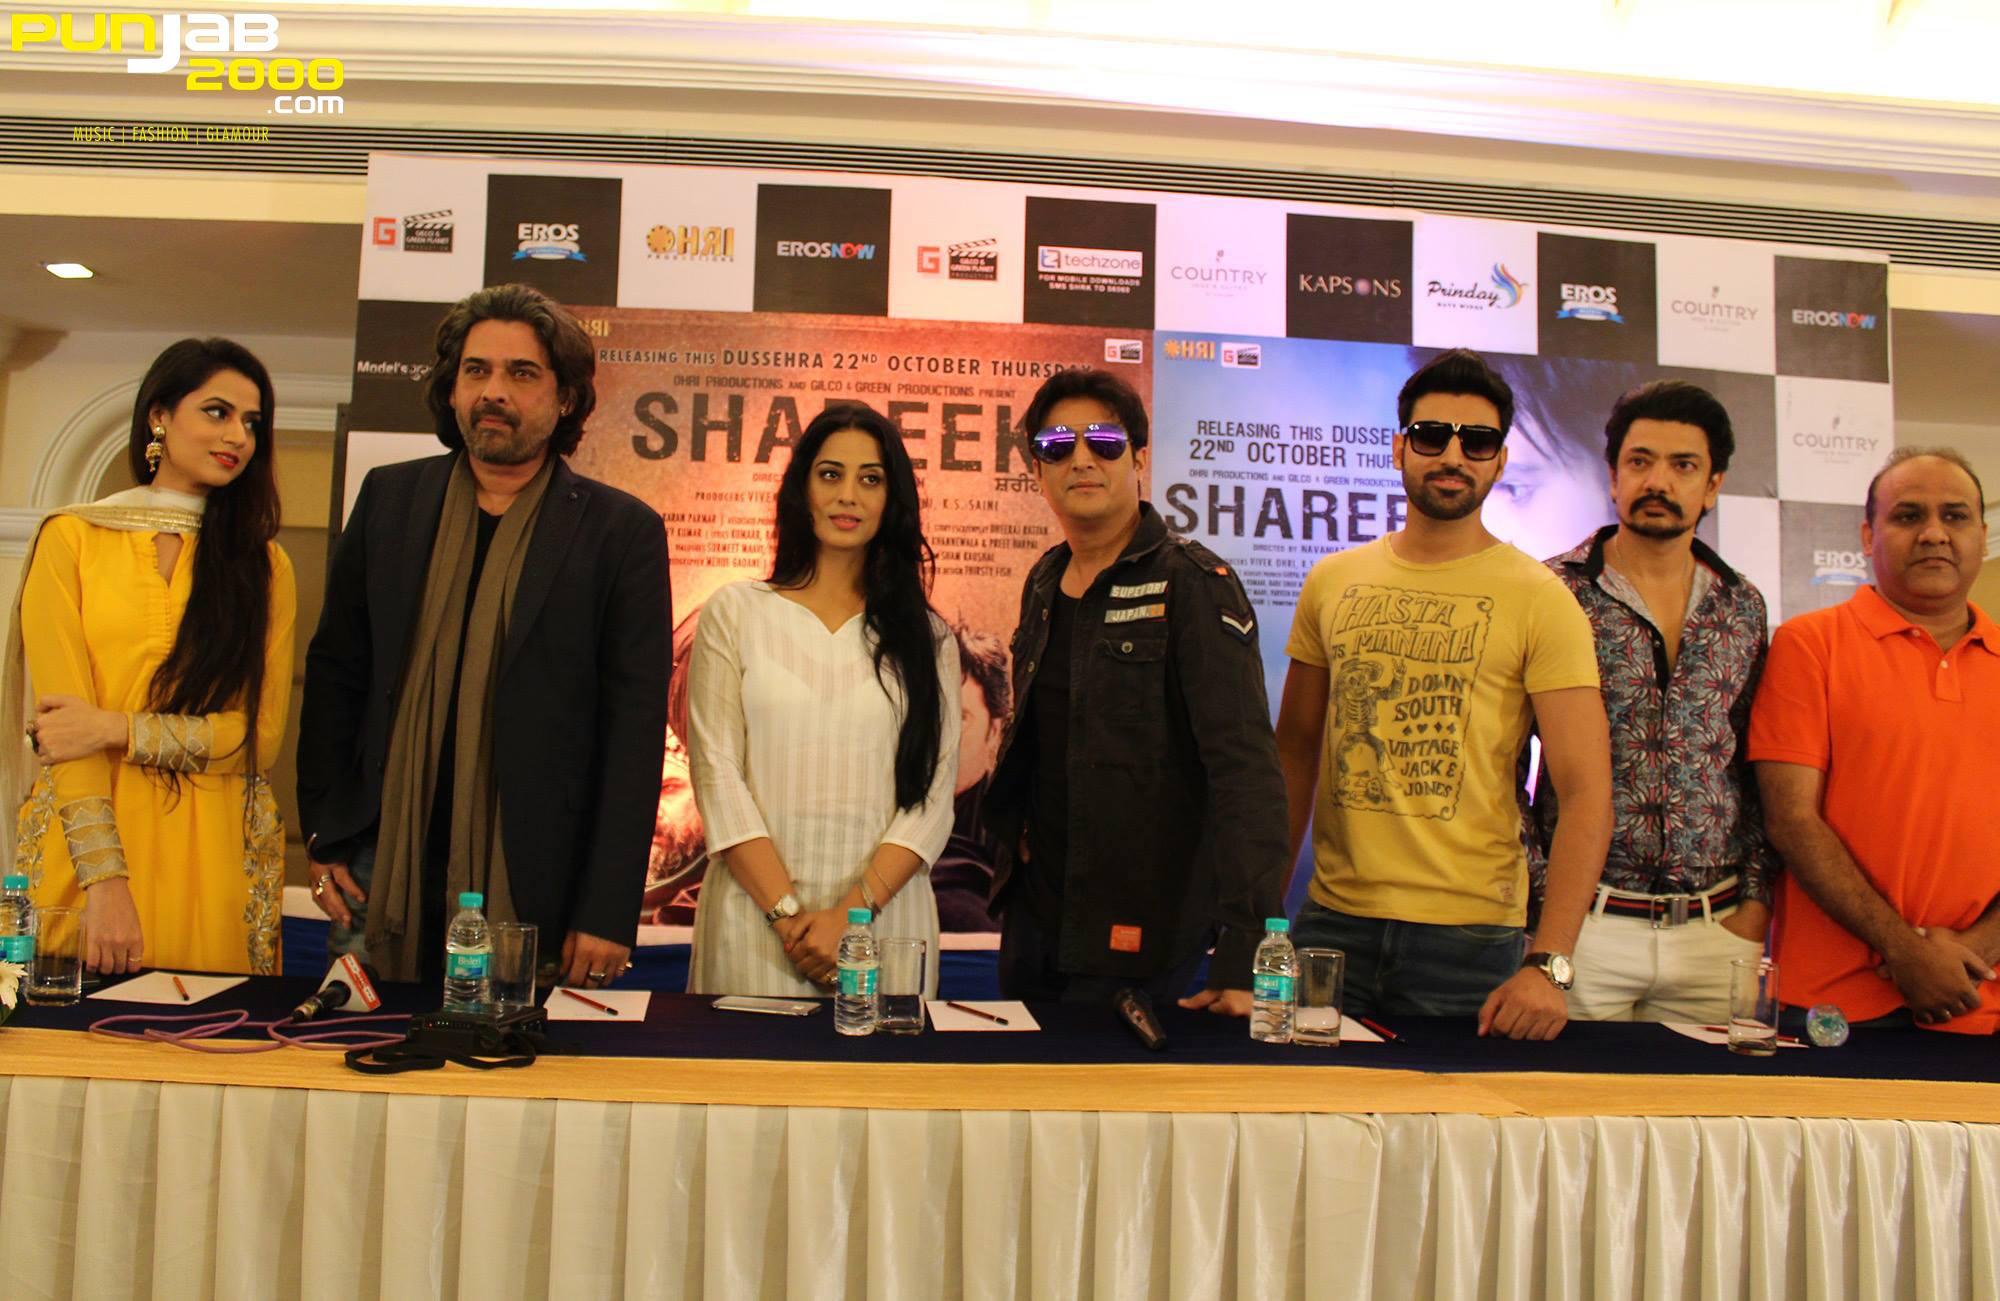 Jimmy Sheirgill, Mahie Gill, Navaniat Singh - Shareek Press Conference